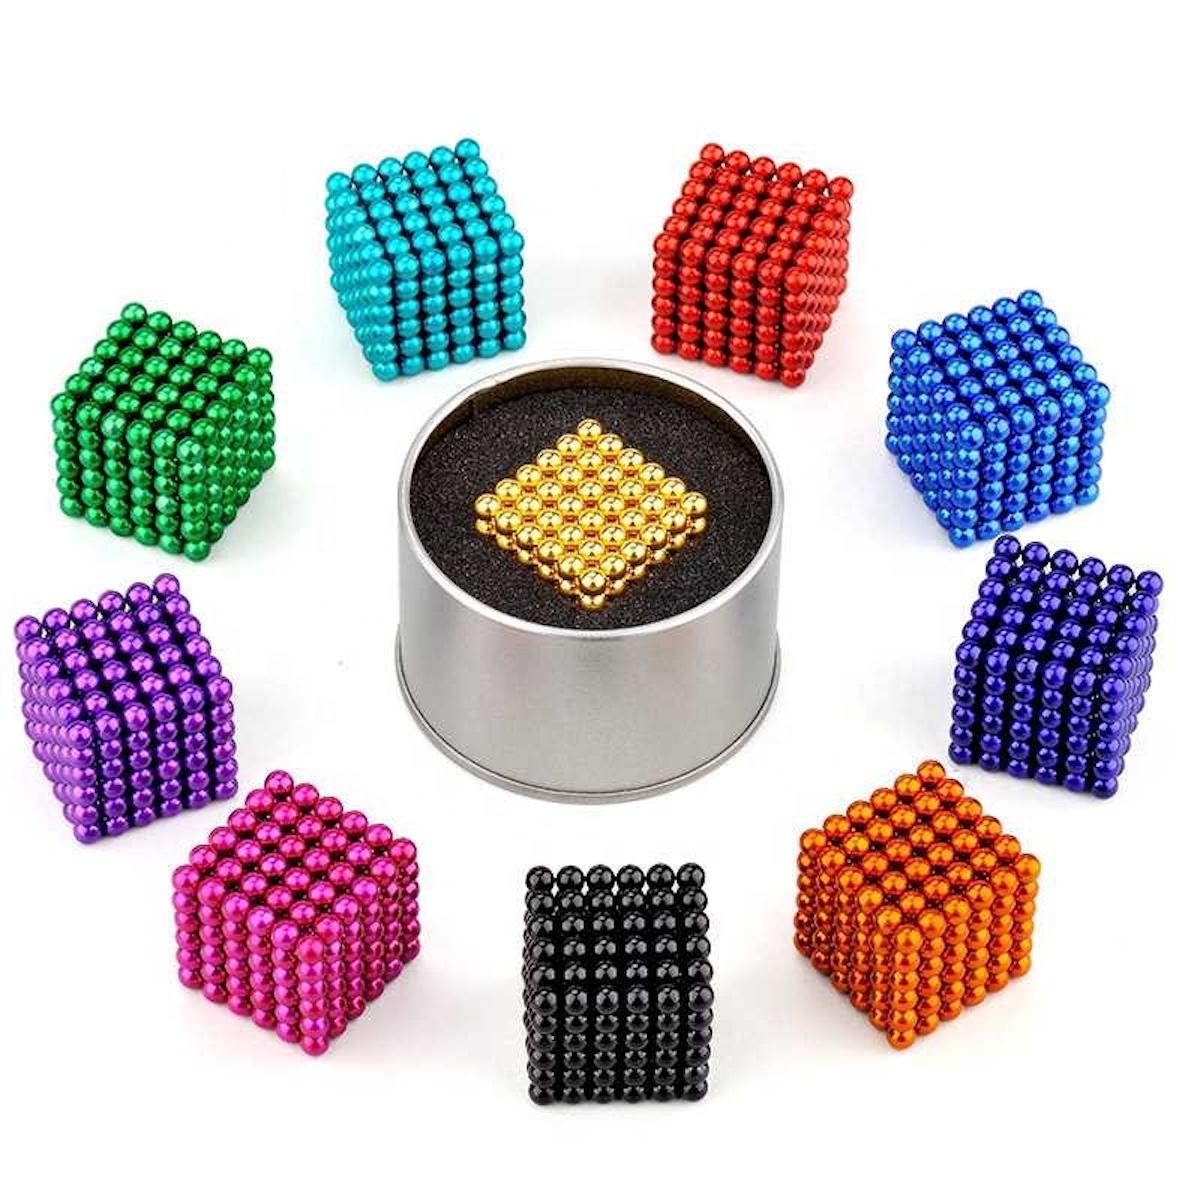 GOLD Neocube 216 Magnet Würfel Neodym Kugelmagnet DIY K... 5mm Neo Ball Cube